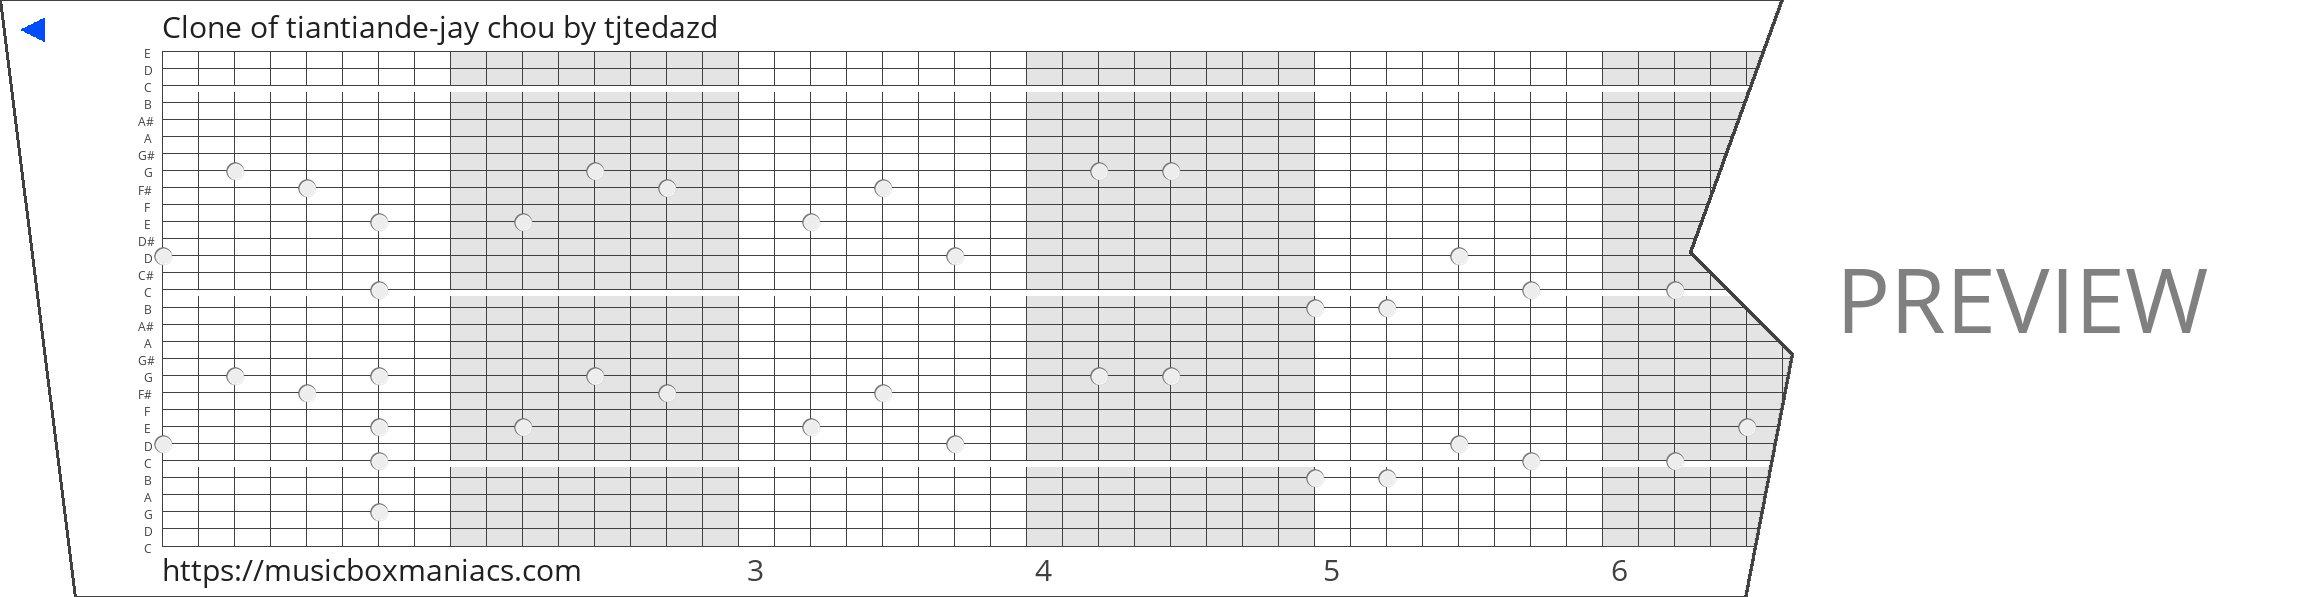 Clone of tiantiande-jay chou 30 note music box paper strip